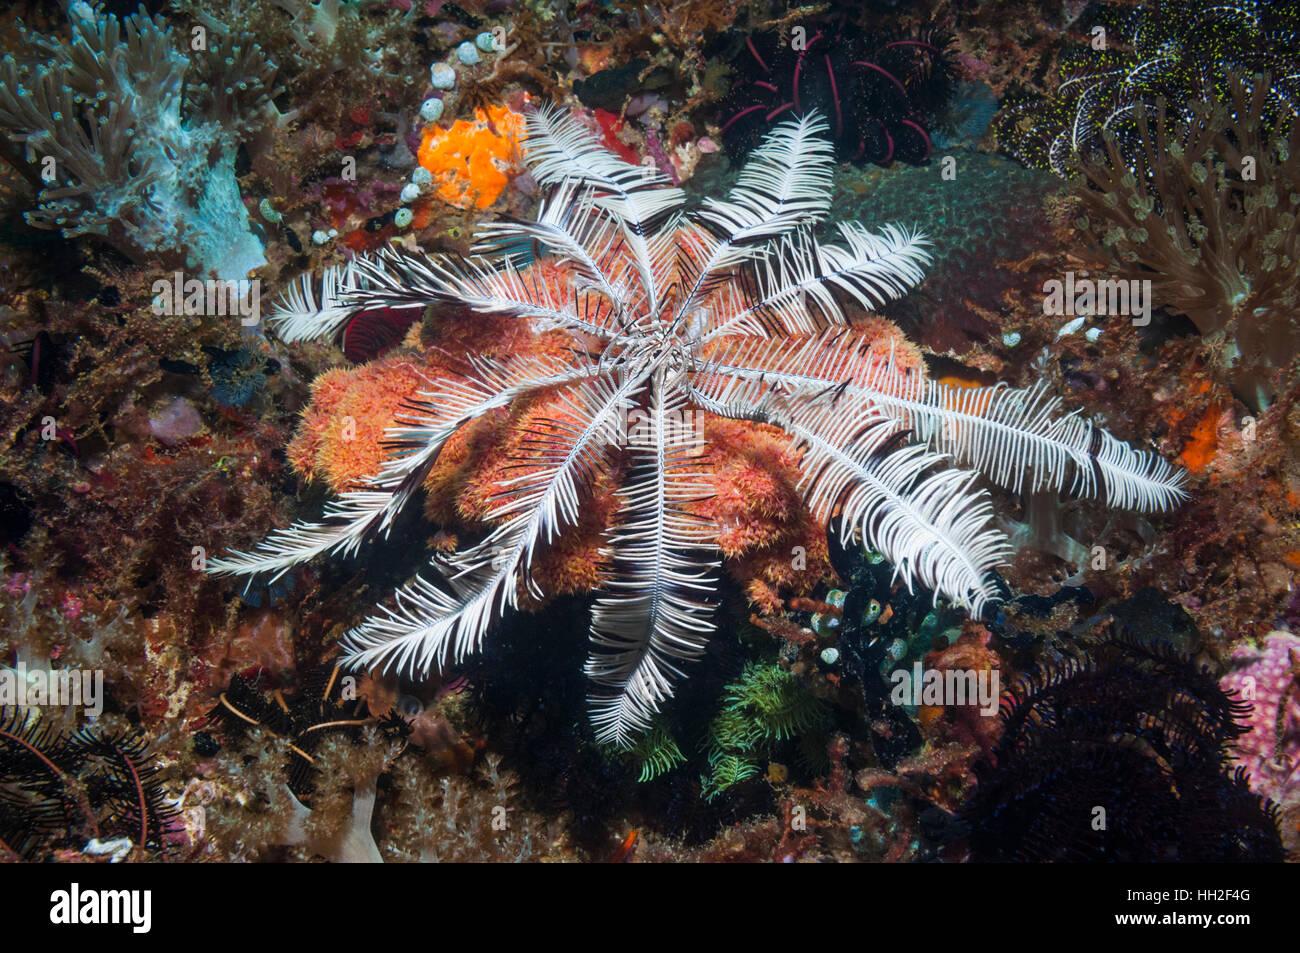 Crinoid or featherstar.  Cebu, Malapascua Island, Philippine. Stock Photo